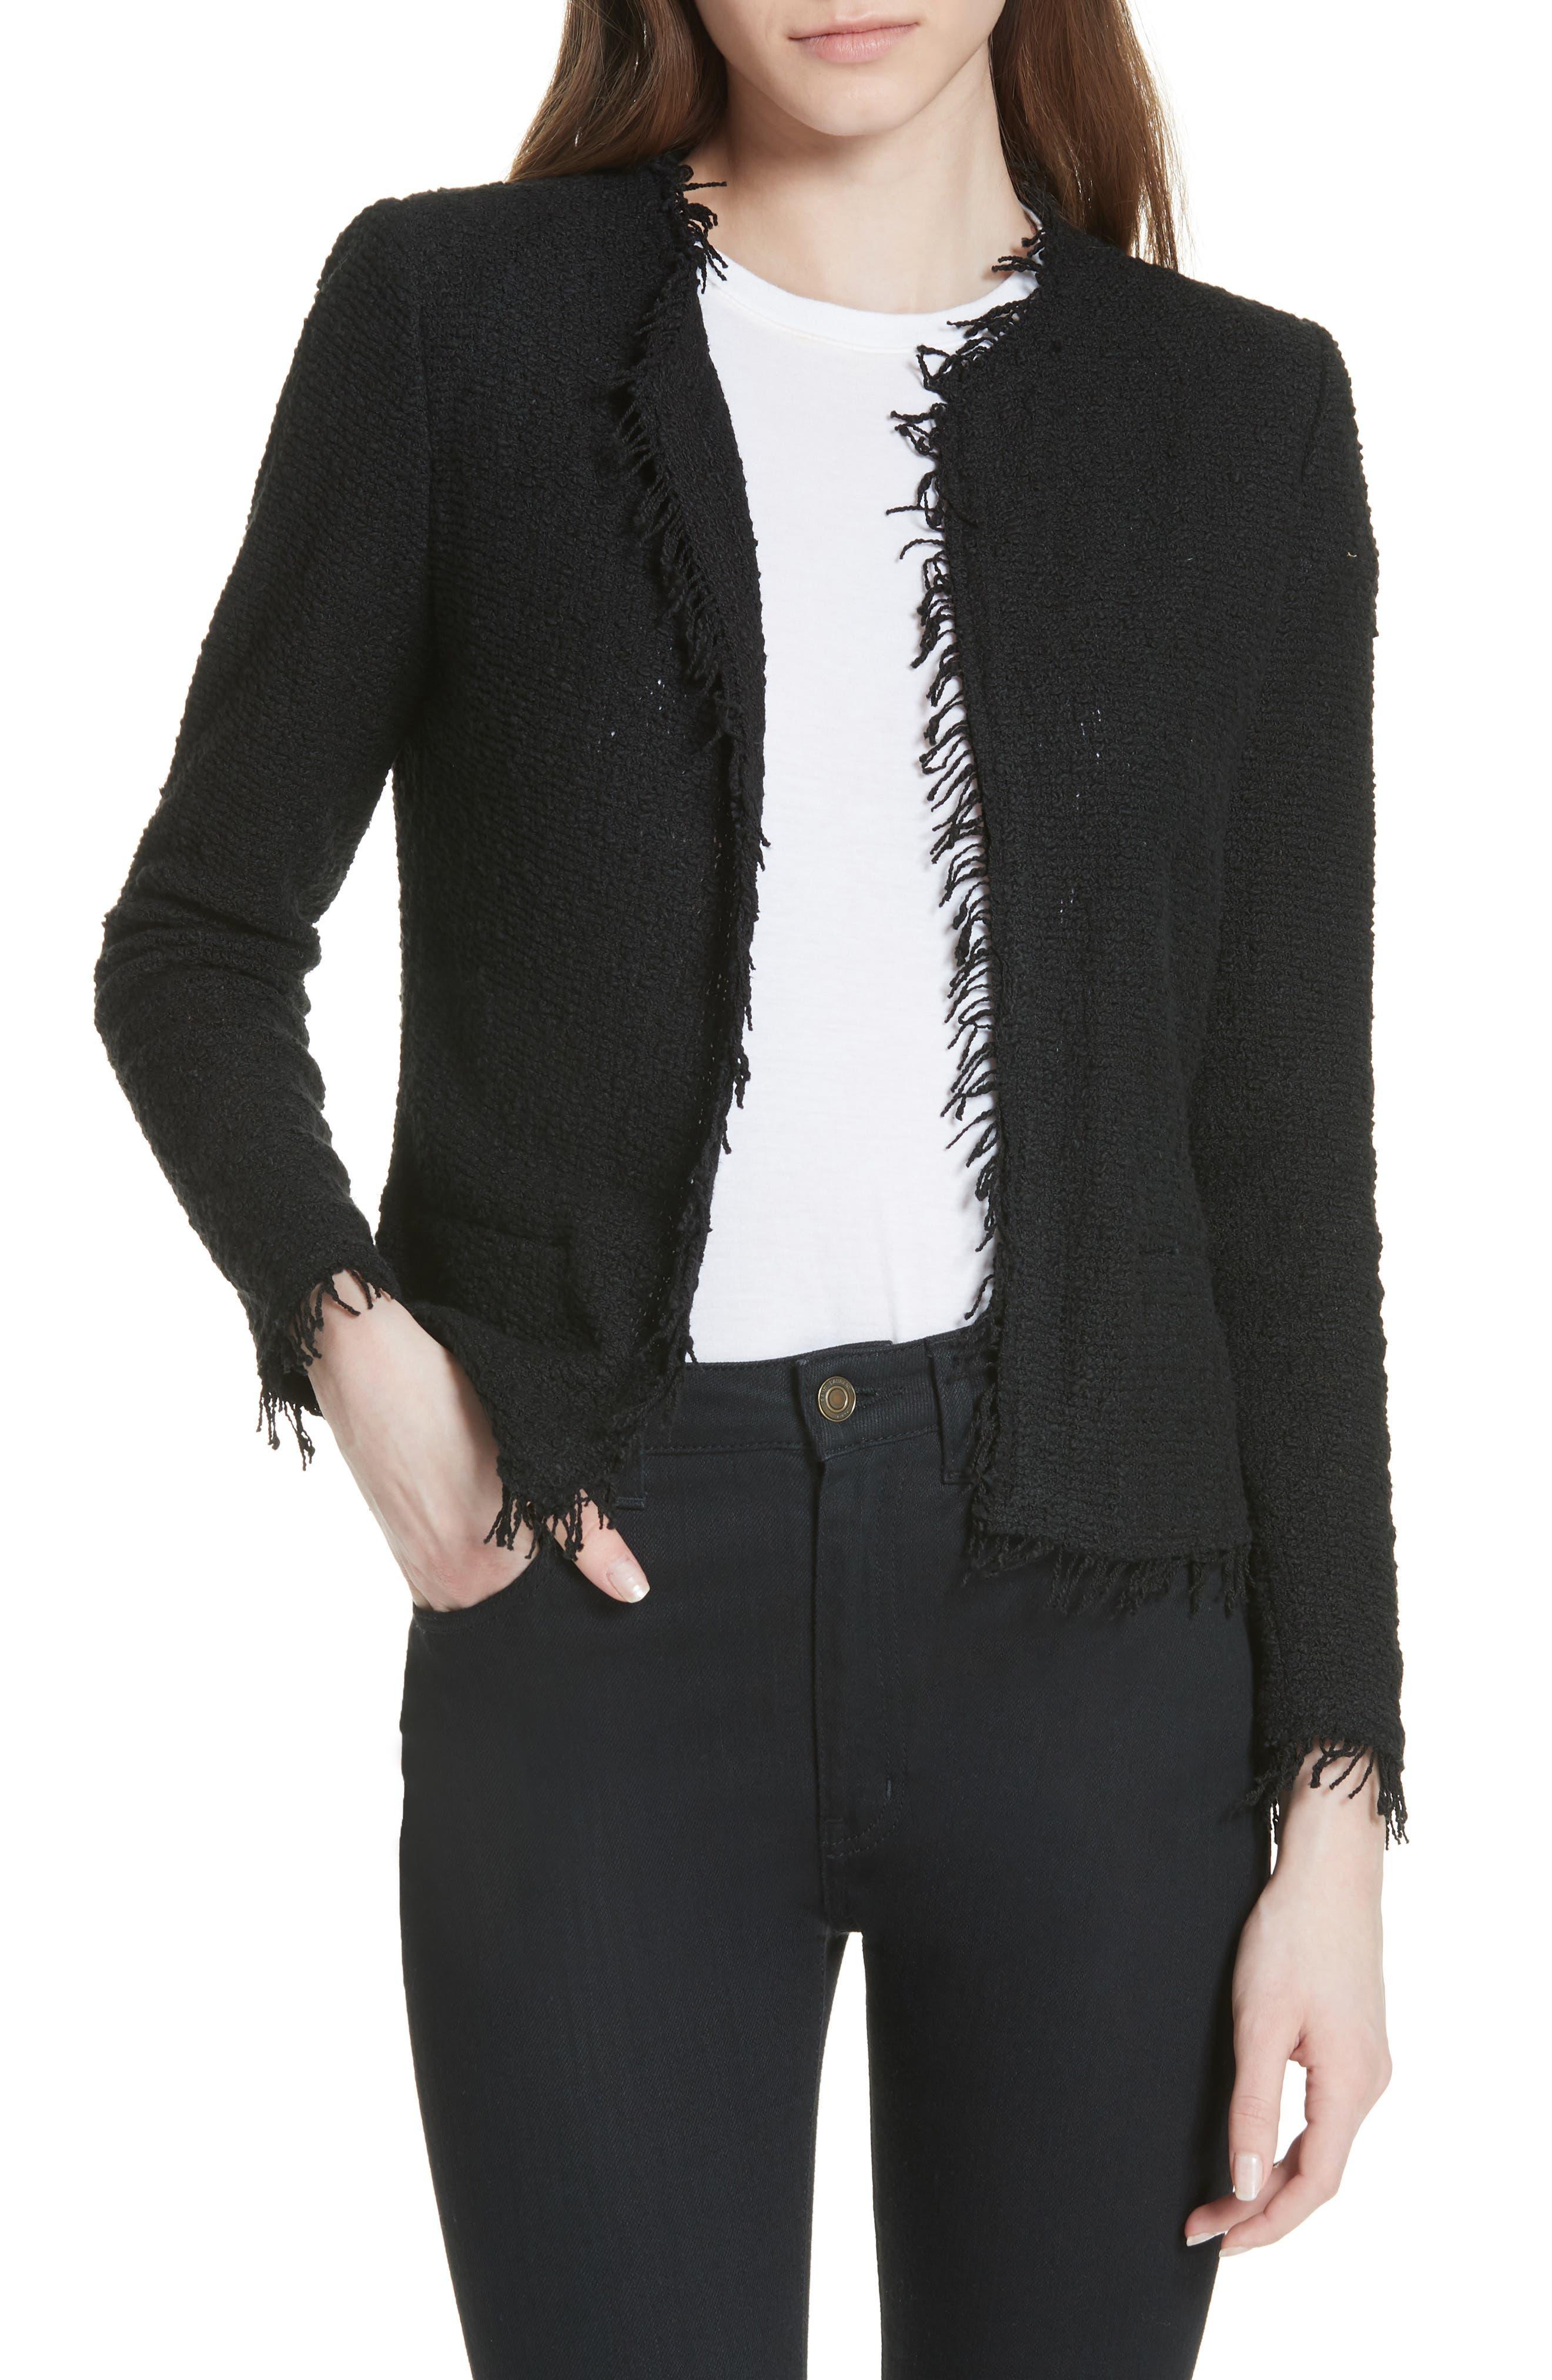 Shavani Tweed Jacket,                             Main thumbnail 1, color,                             Black